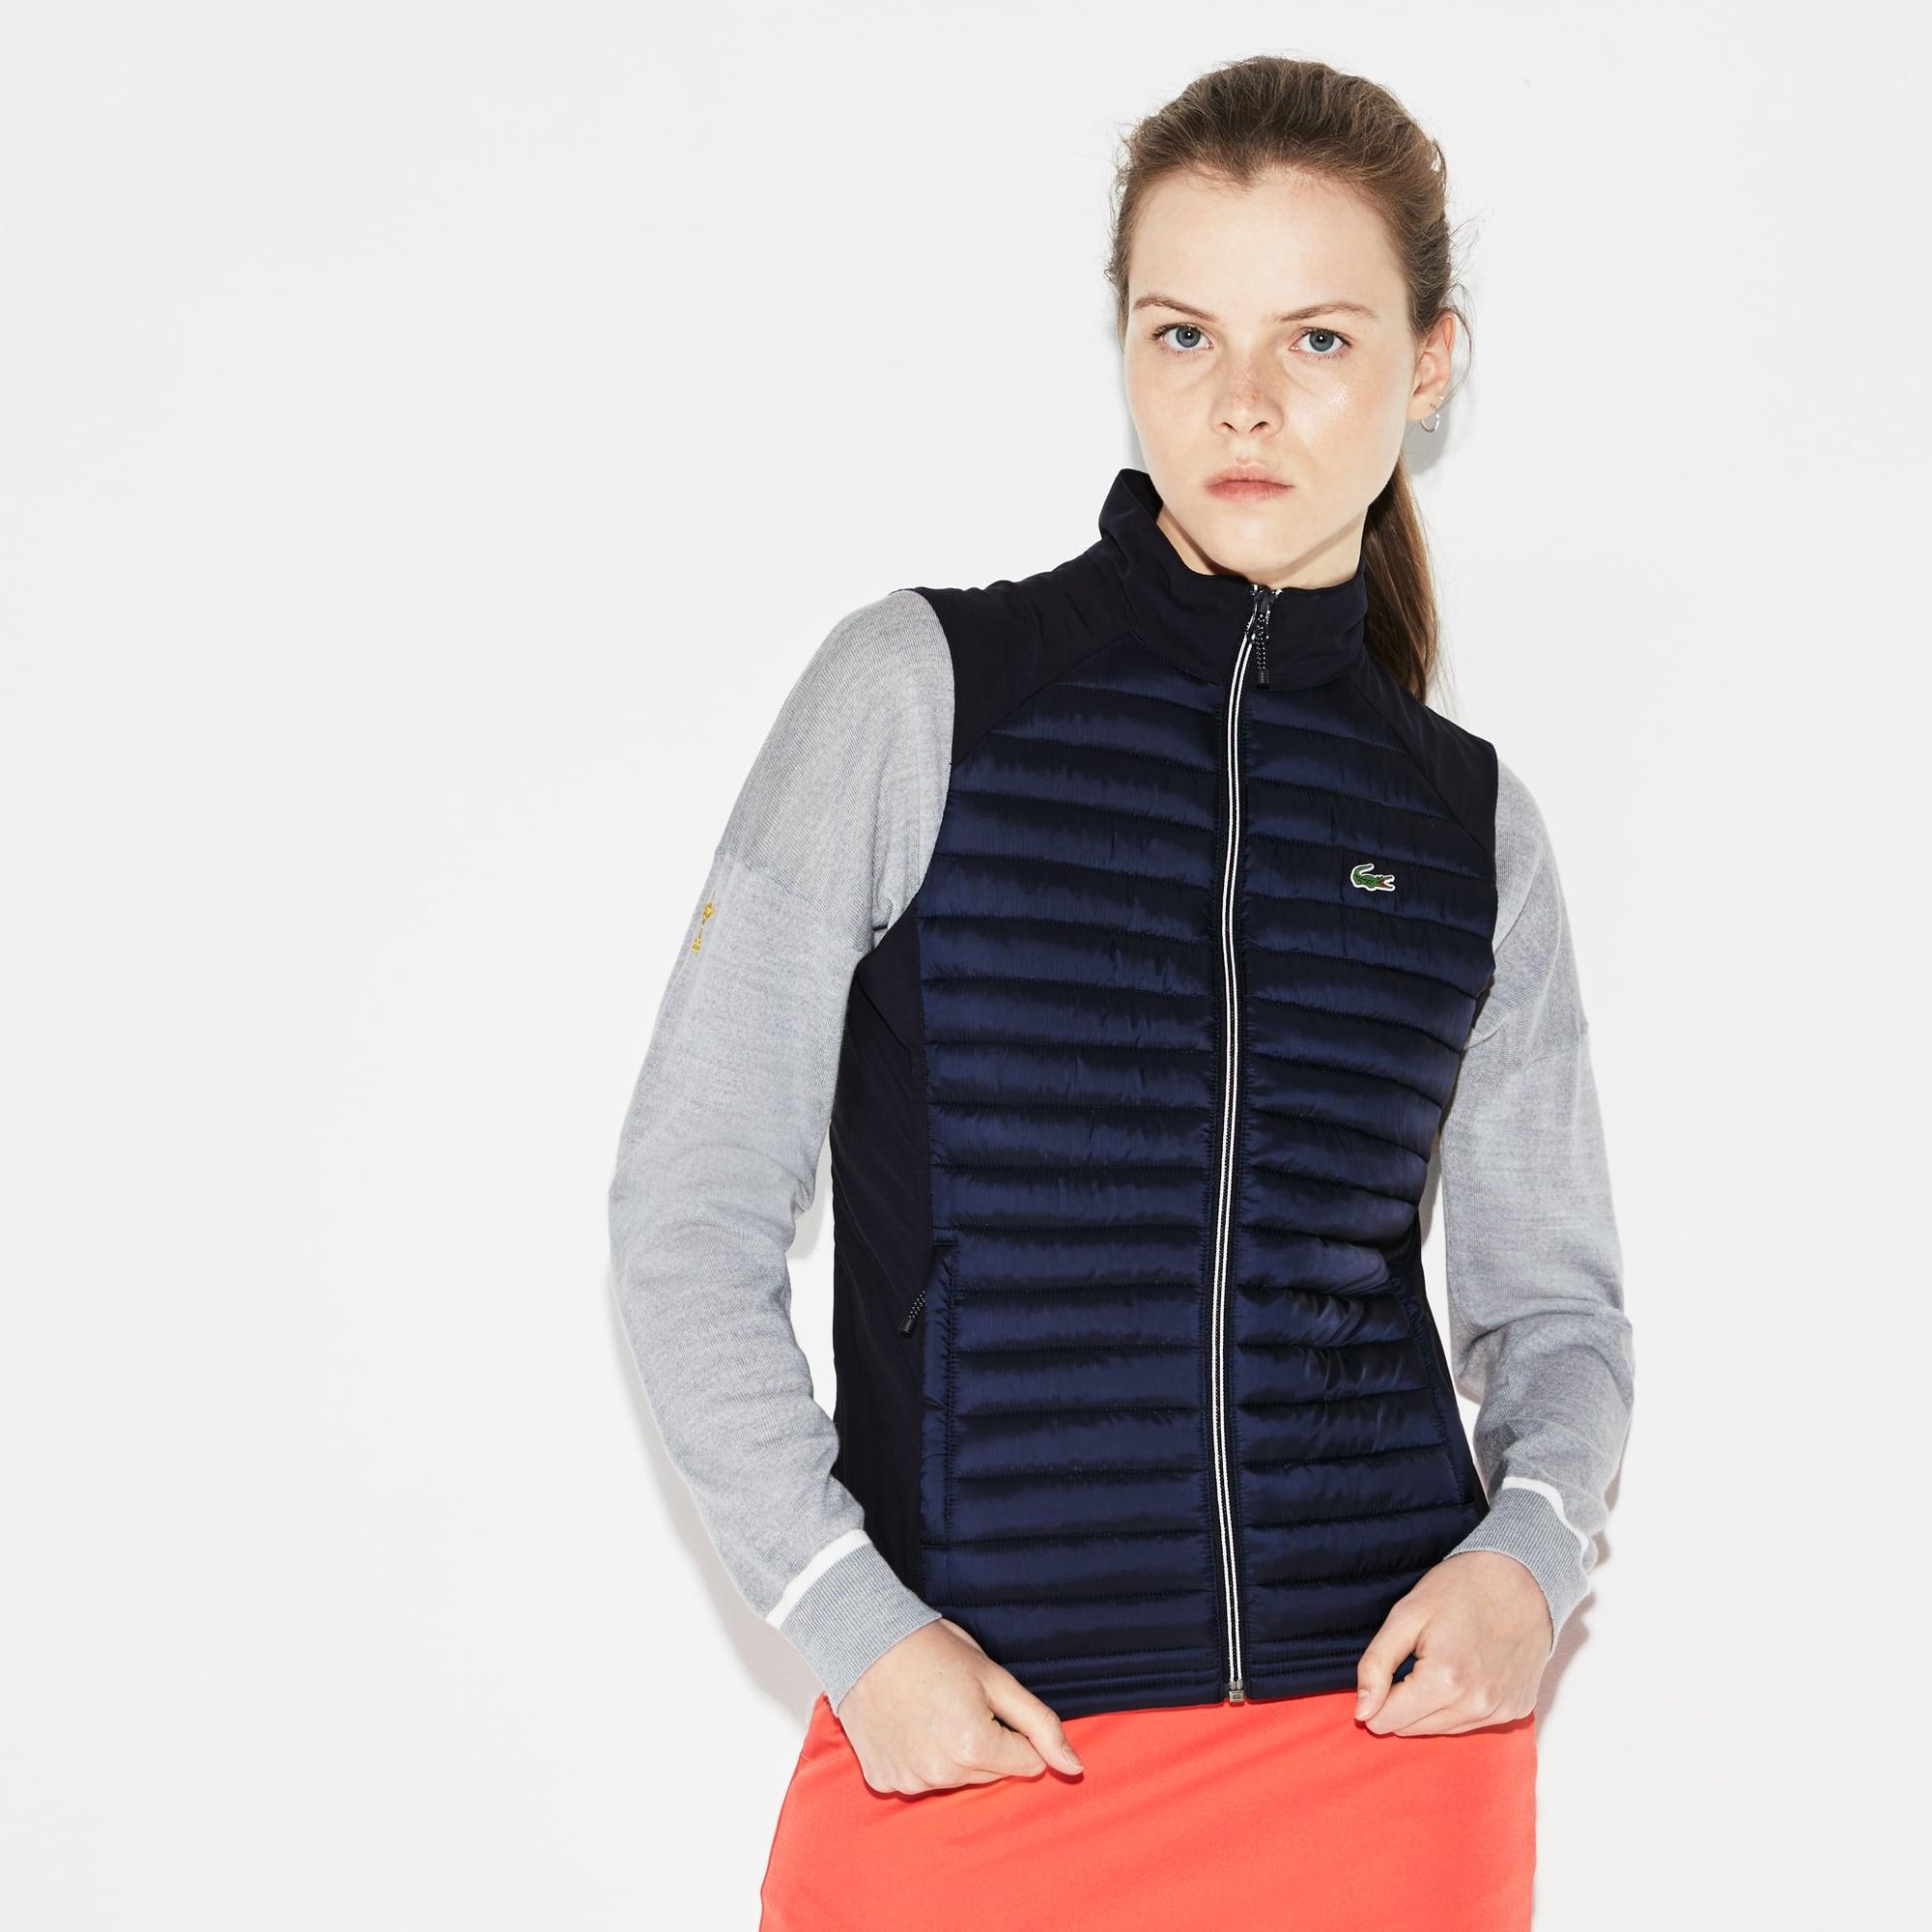 Women's Lacoste SPORT Ryder Cup Edition Technical Golf Vest